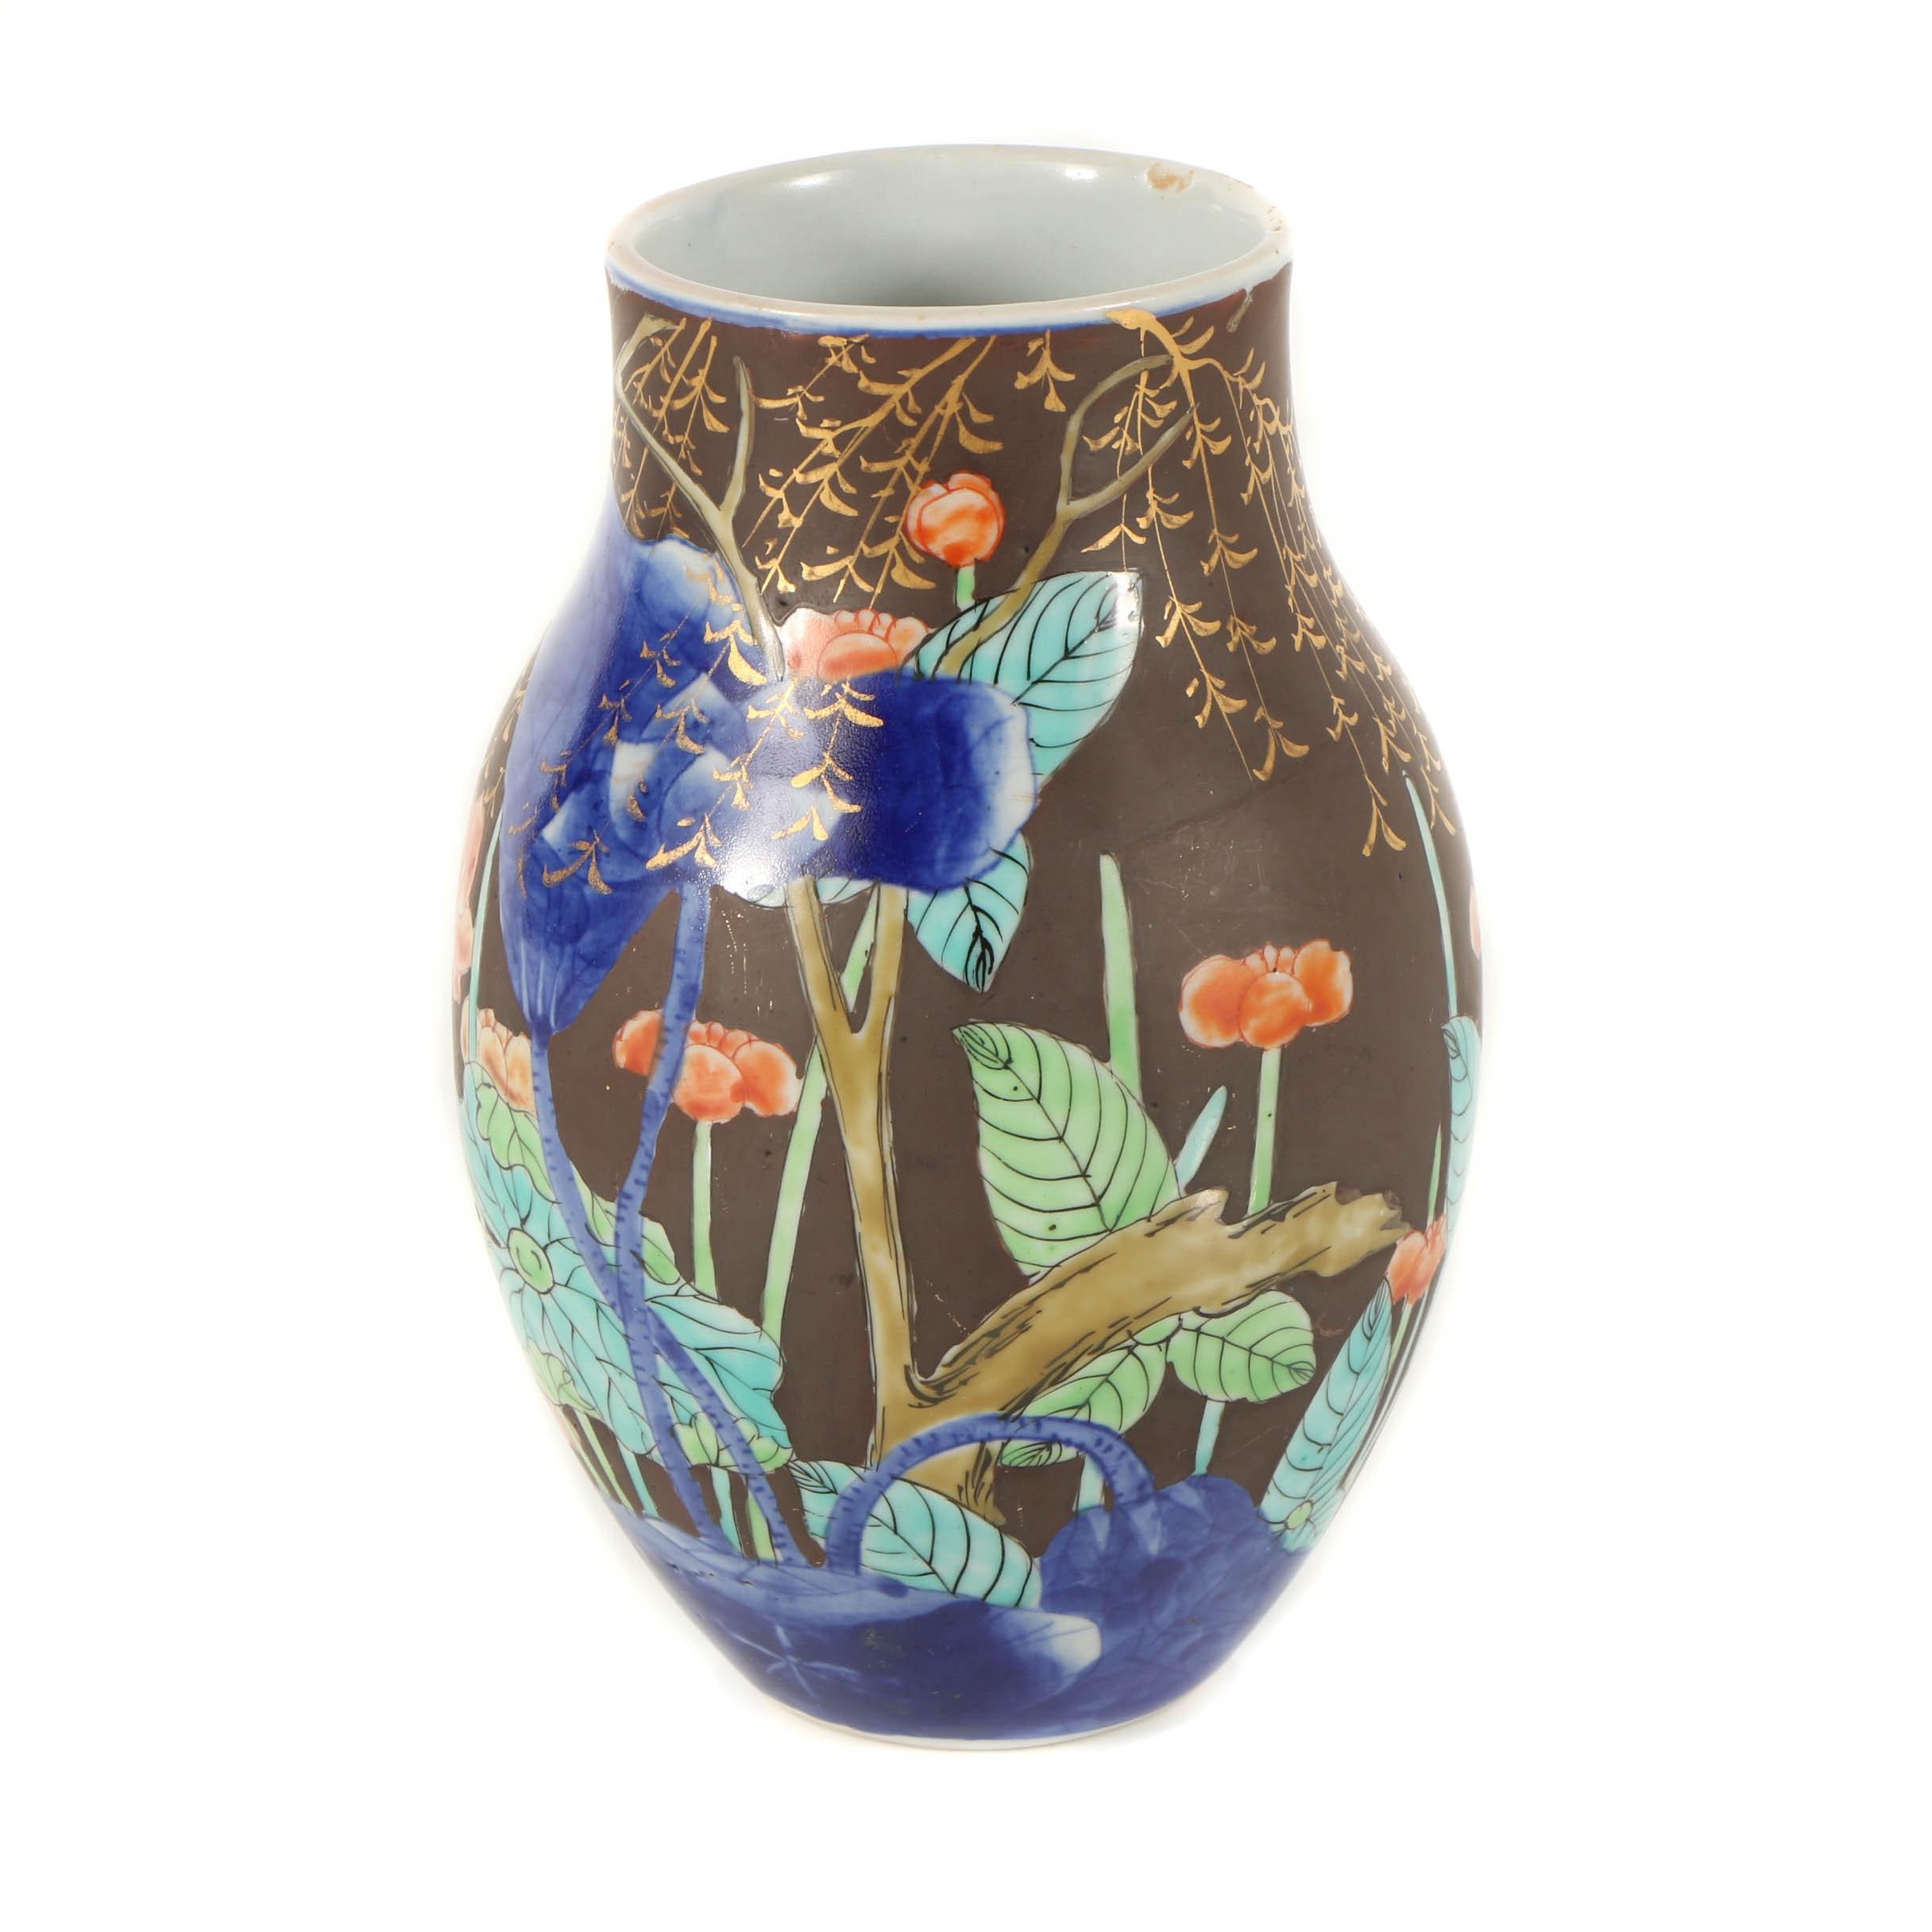 Japanese Porcelain Decorative Vase